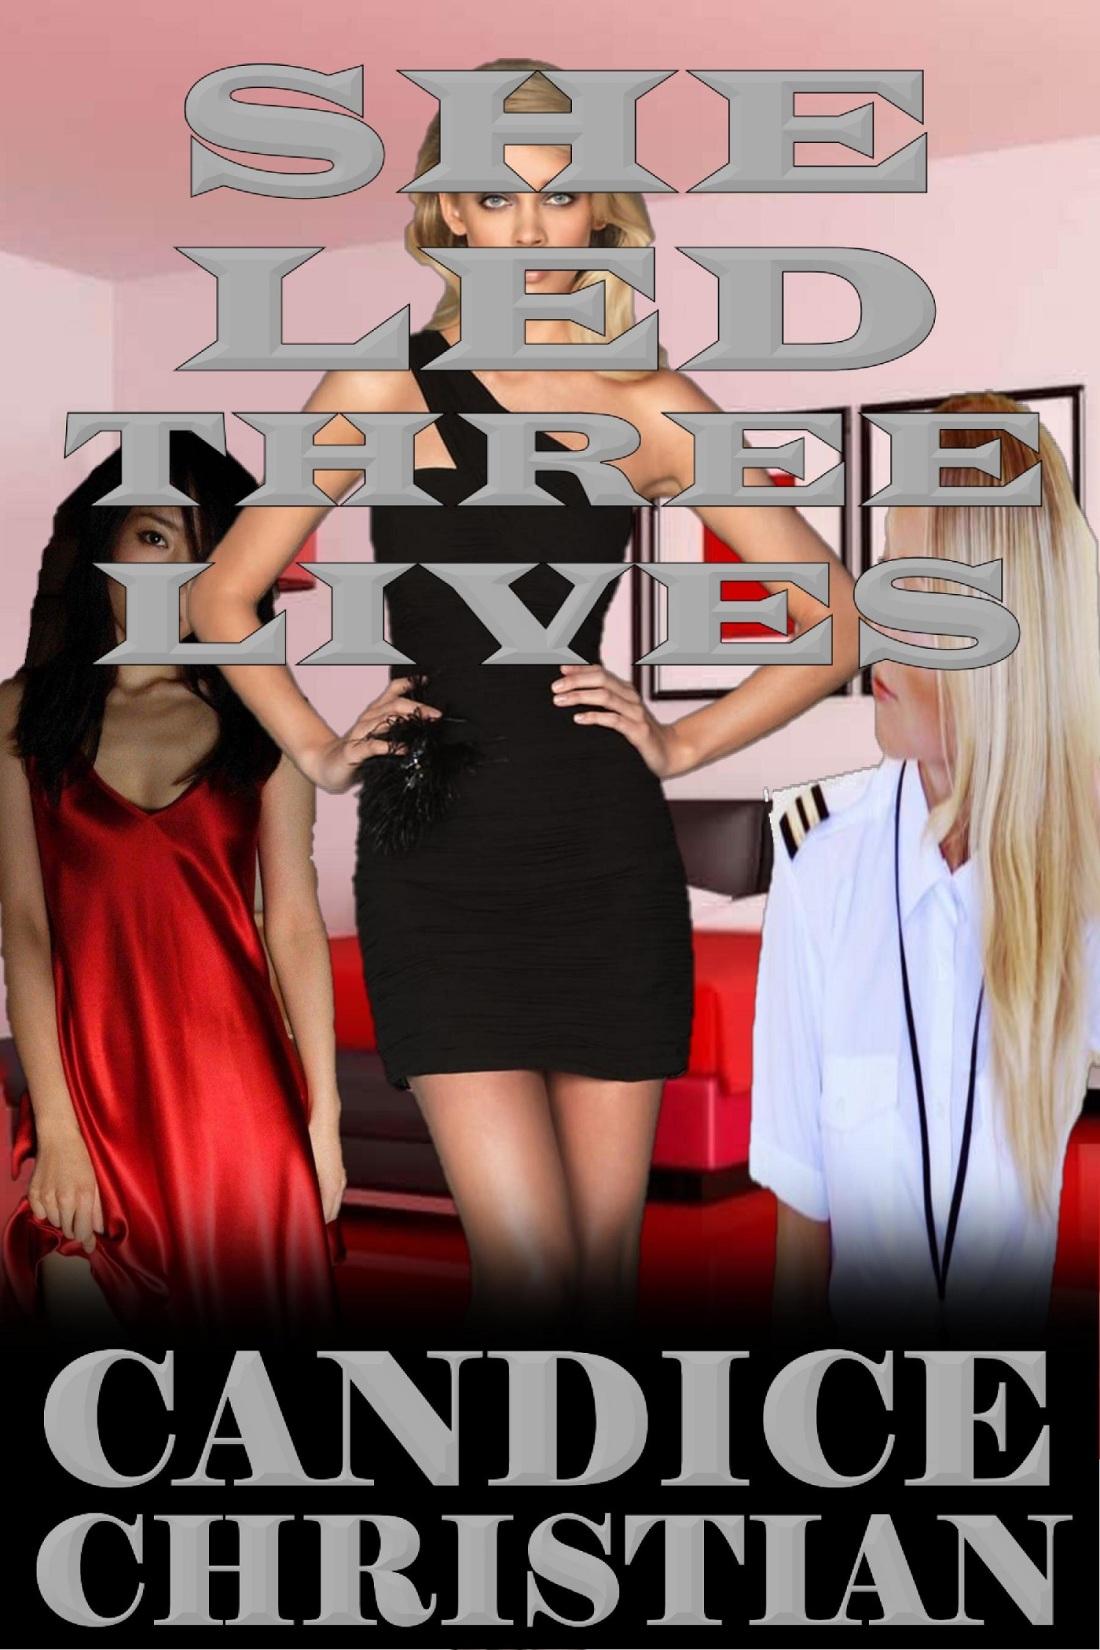 SHE LED THREE LIVES COVER-RESIZED